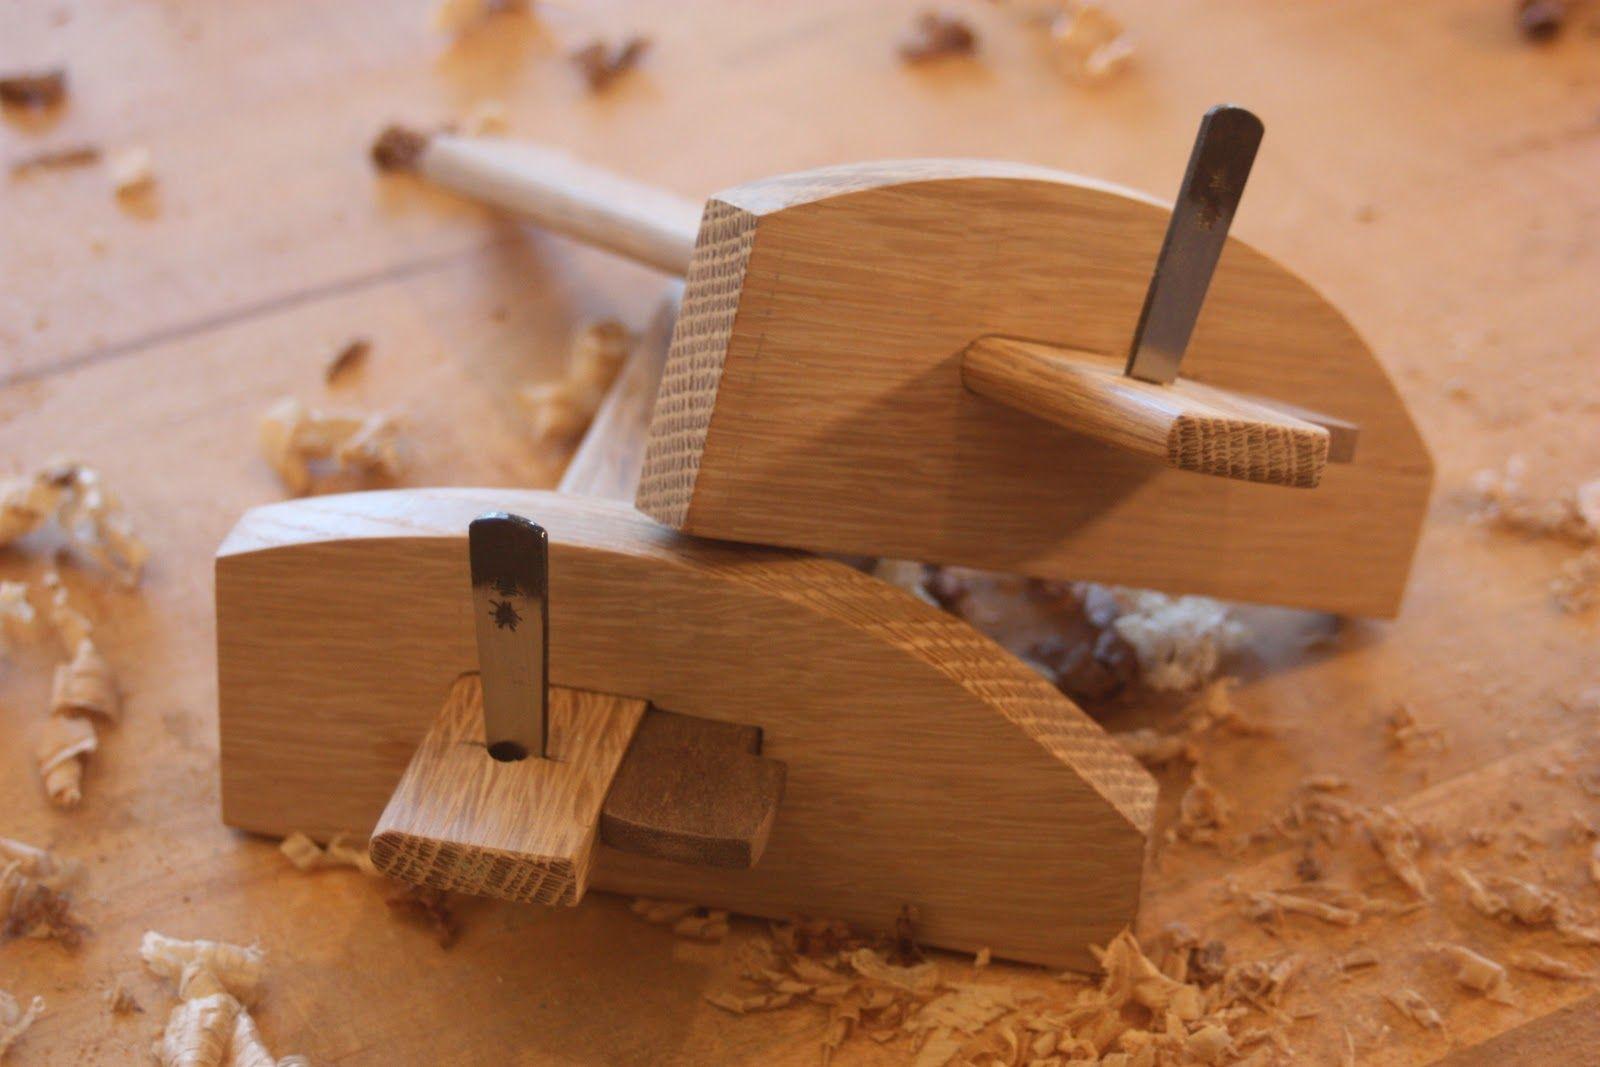 Marking Gauge Workshop Tools To Make Japanese